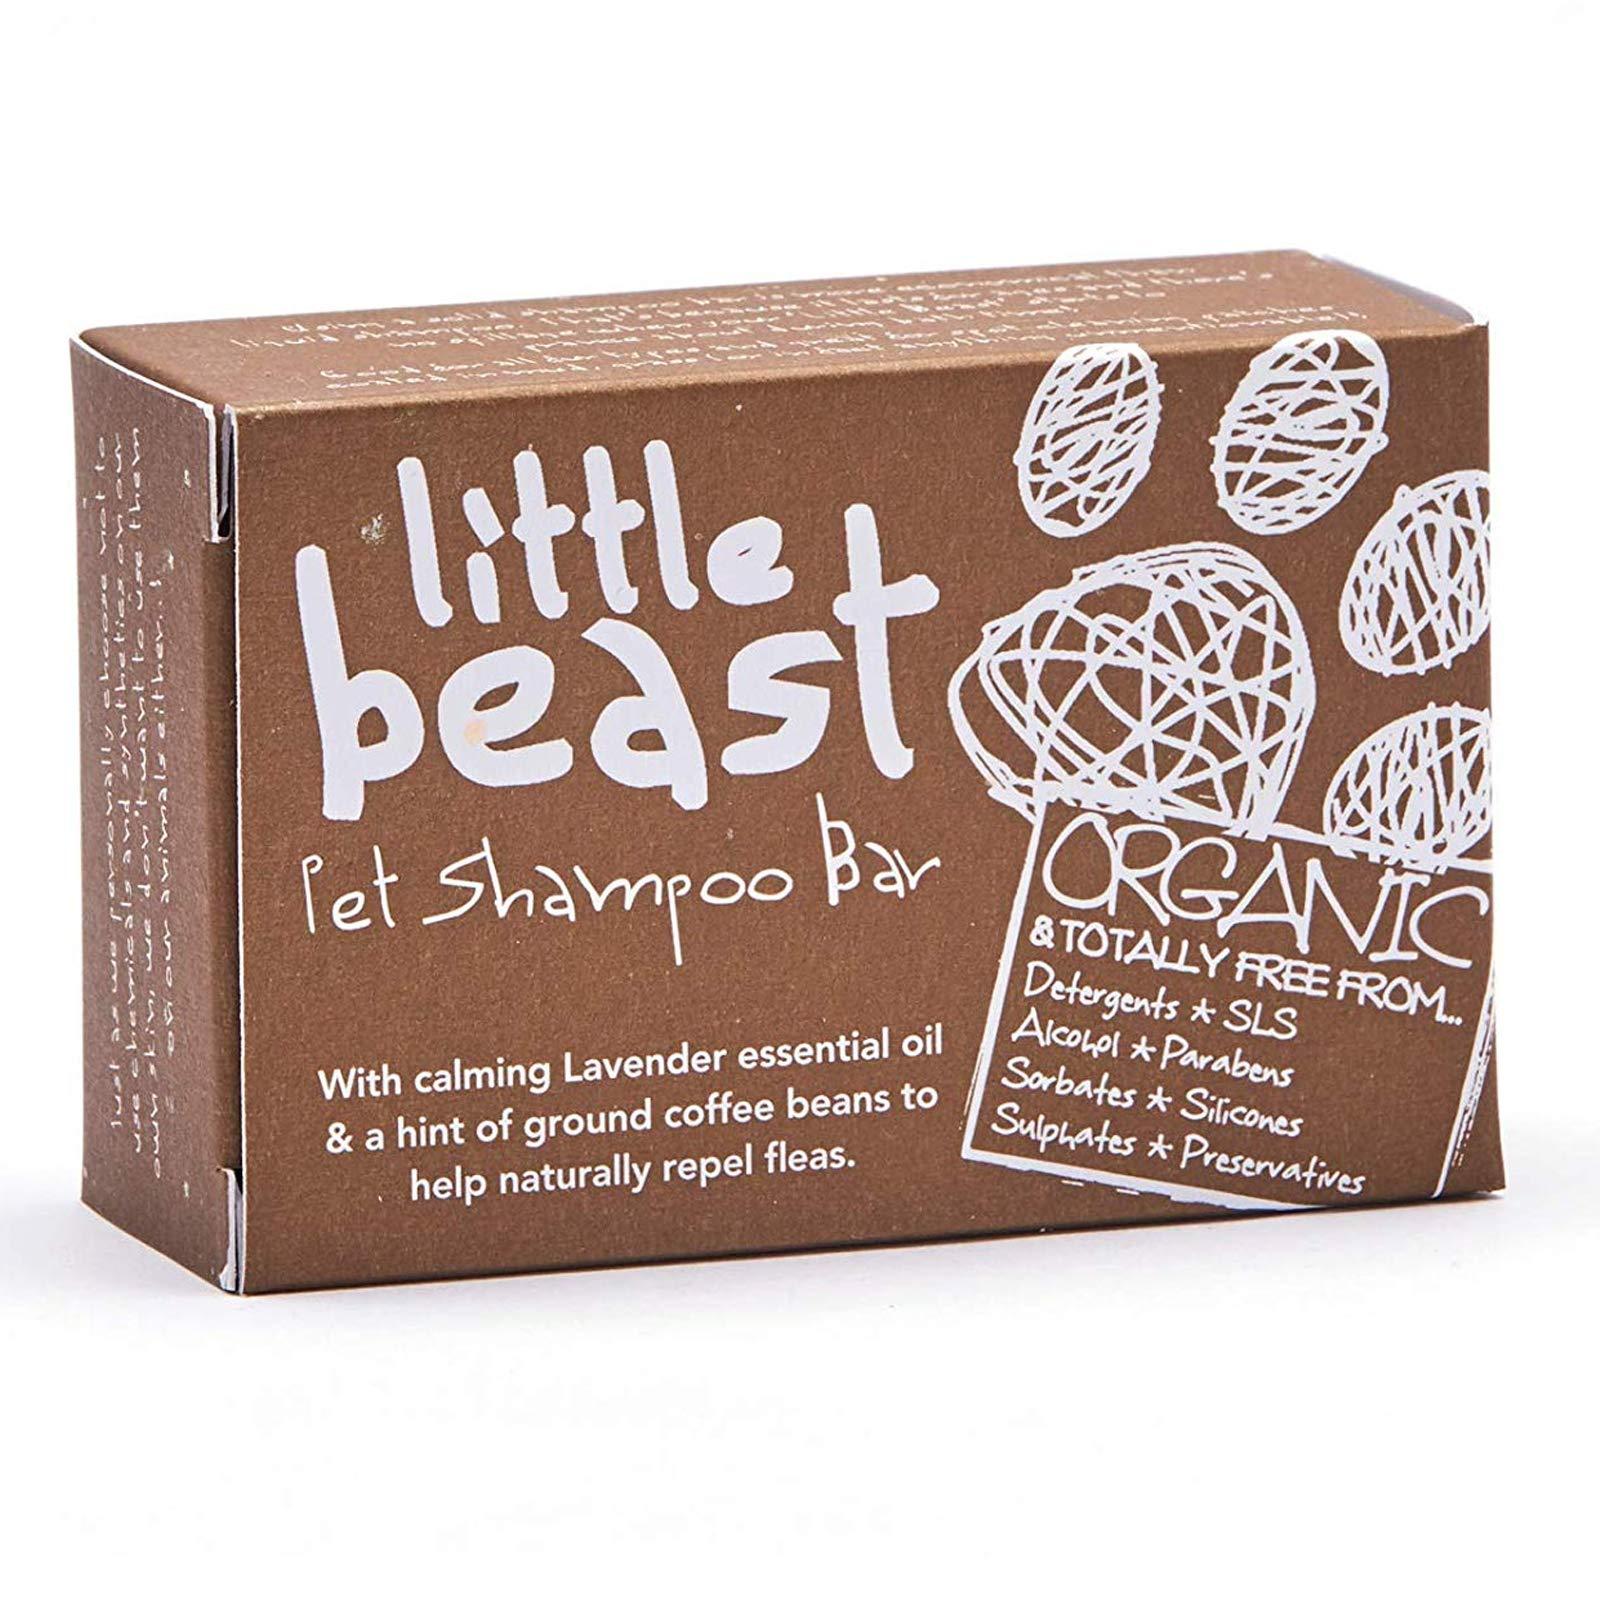 Little Beast Organic Pet Grooming Shampoo Bar – Natural & Vegan (110g)